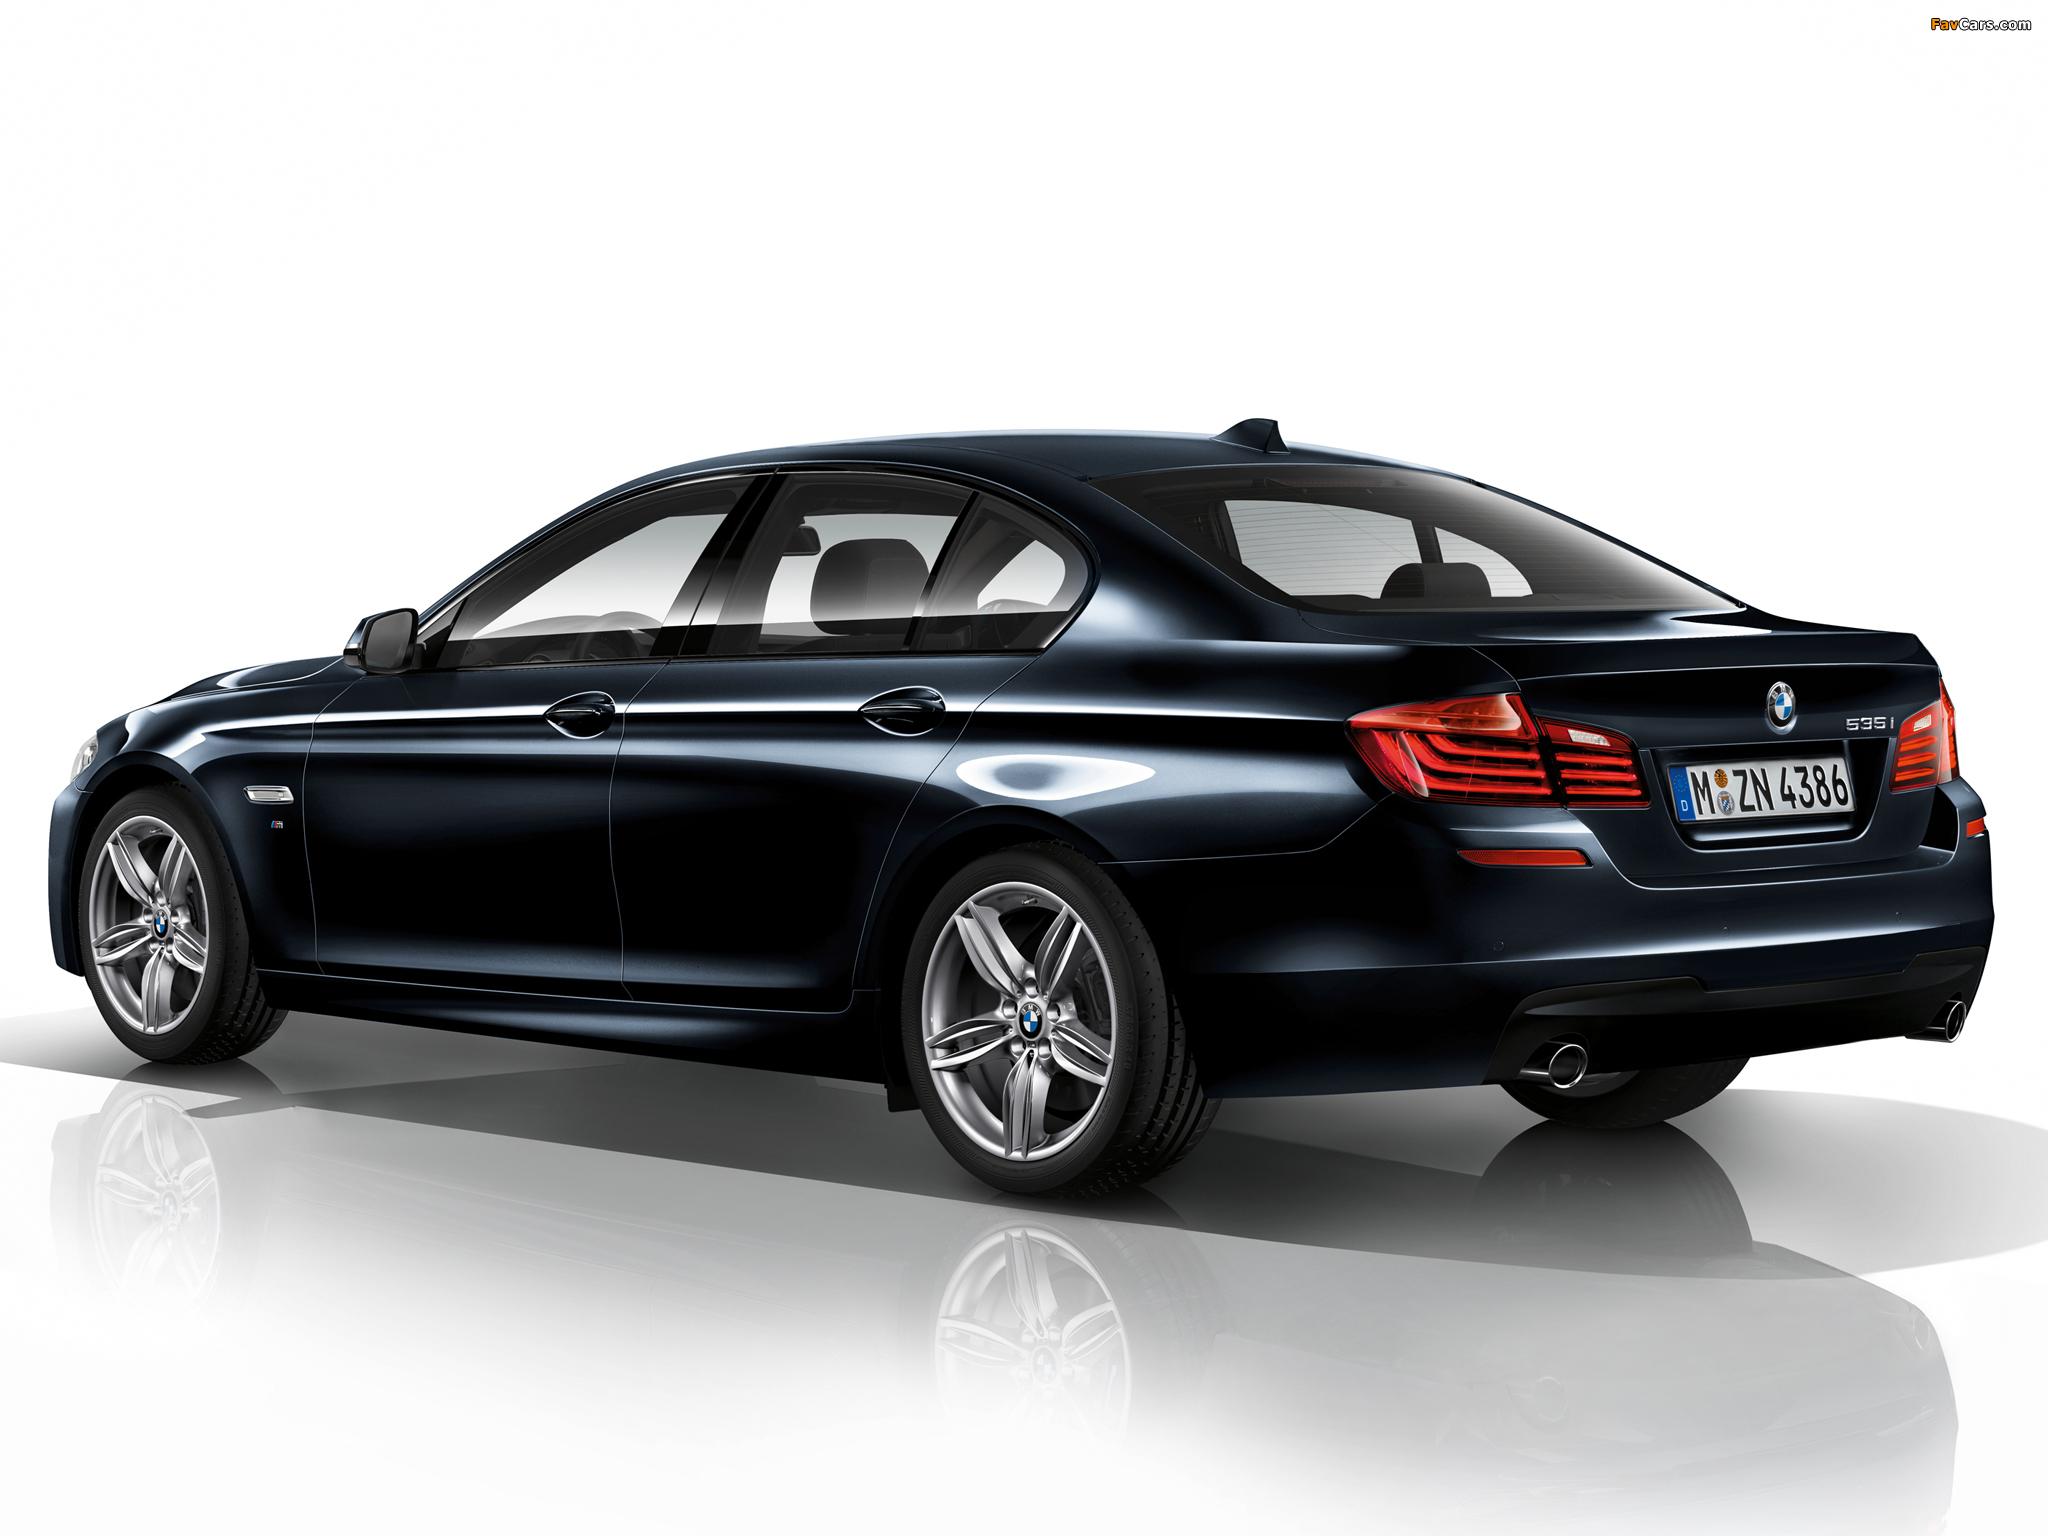 BMW 535i Sedan M Sport Package F10 2013 Images 2048 X 1536